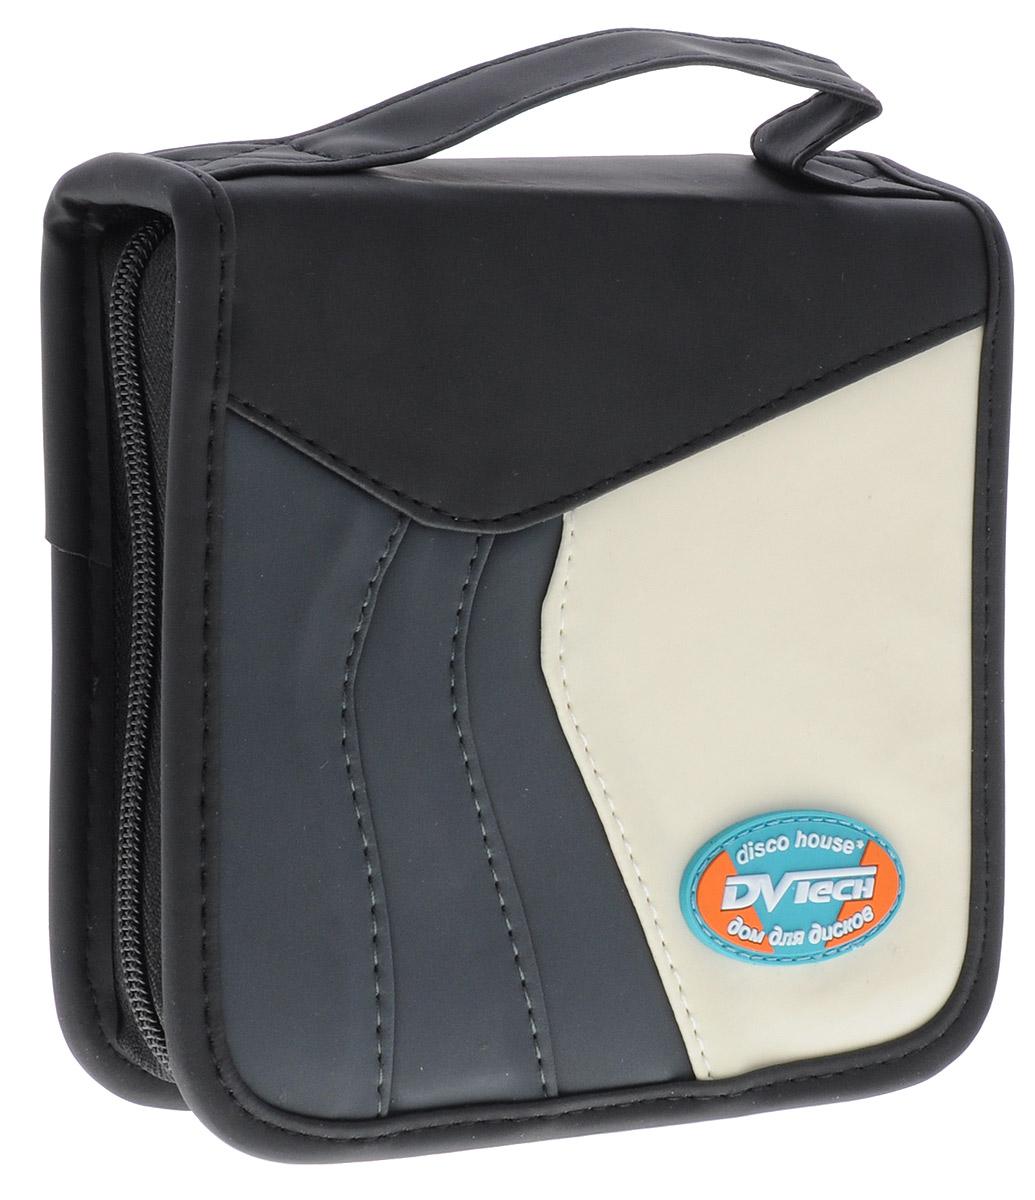 DVTech WCL-40 сумка для хранения дисков